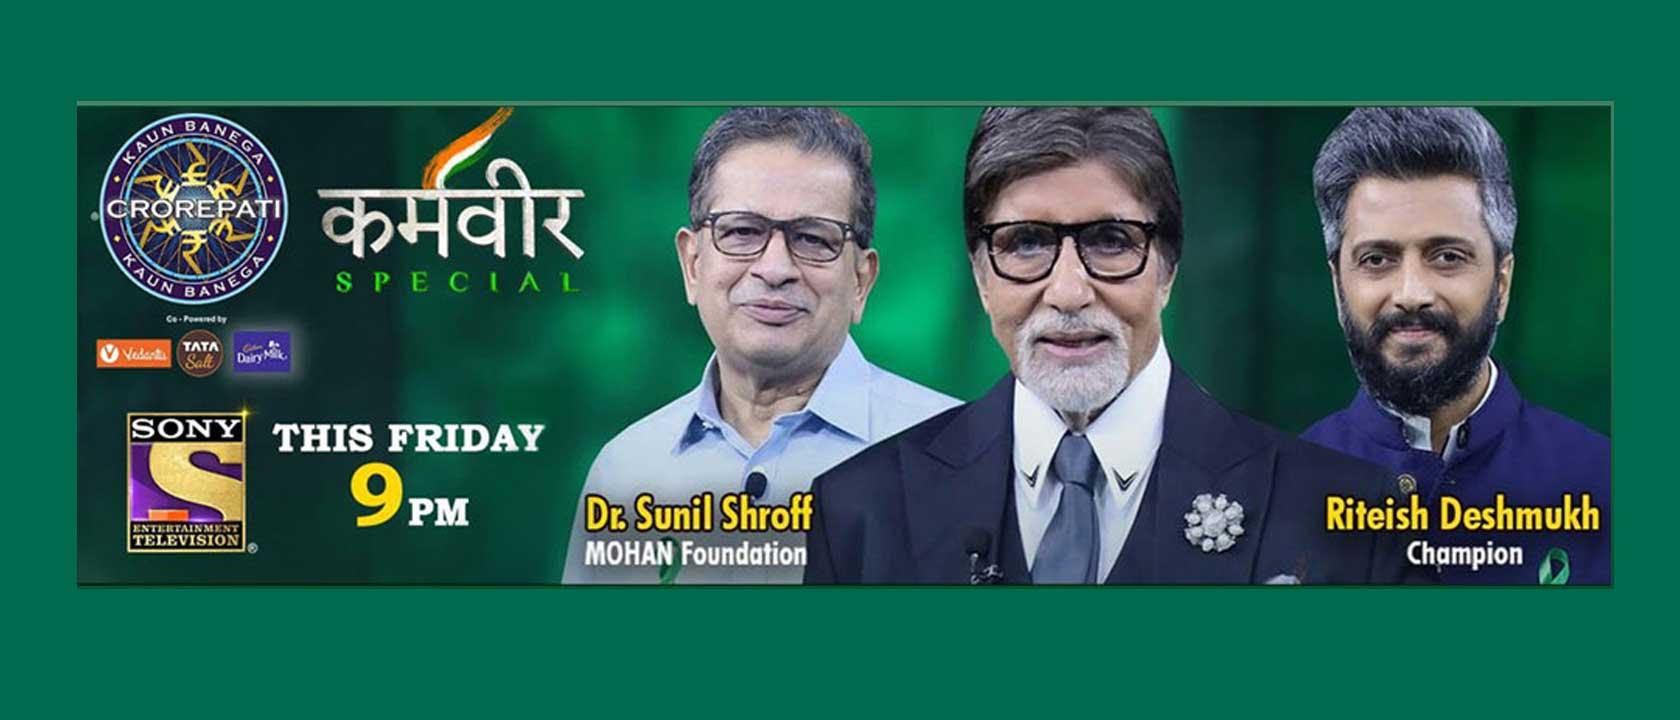 Being a Karamveer on Amitabh Bachchan's Show – 'Kaun Banega Crorepati'